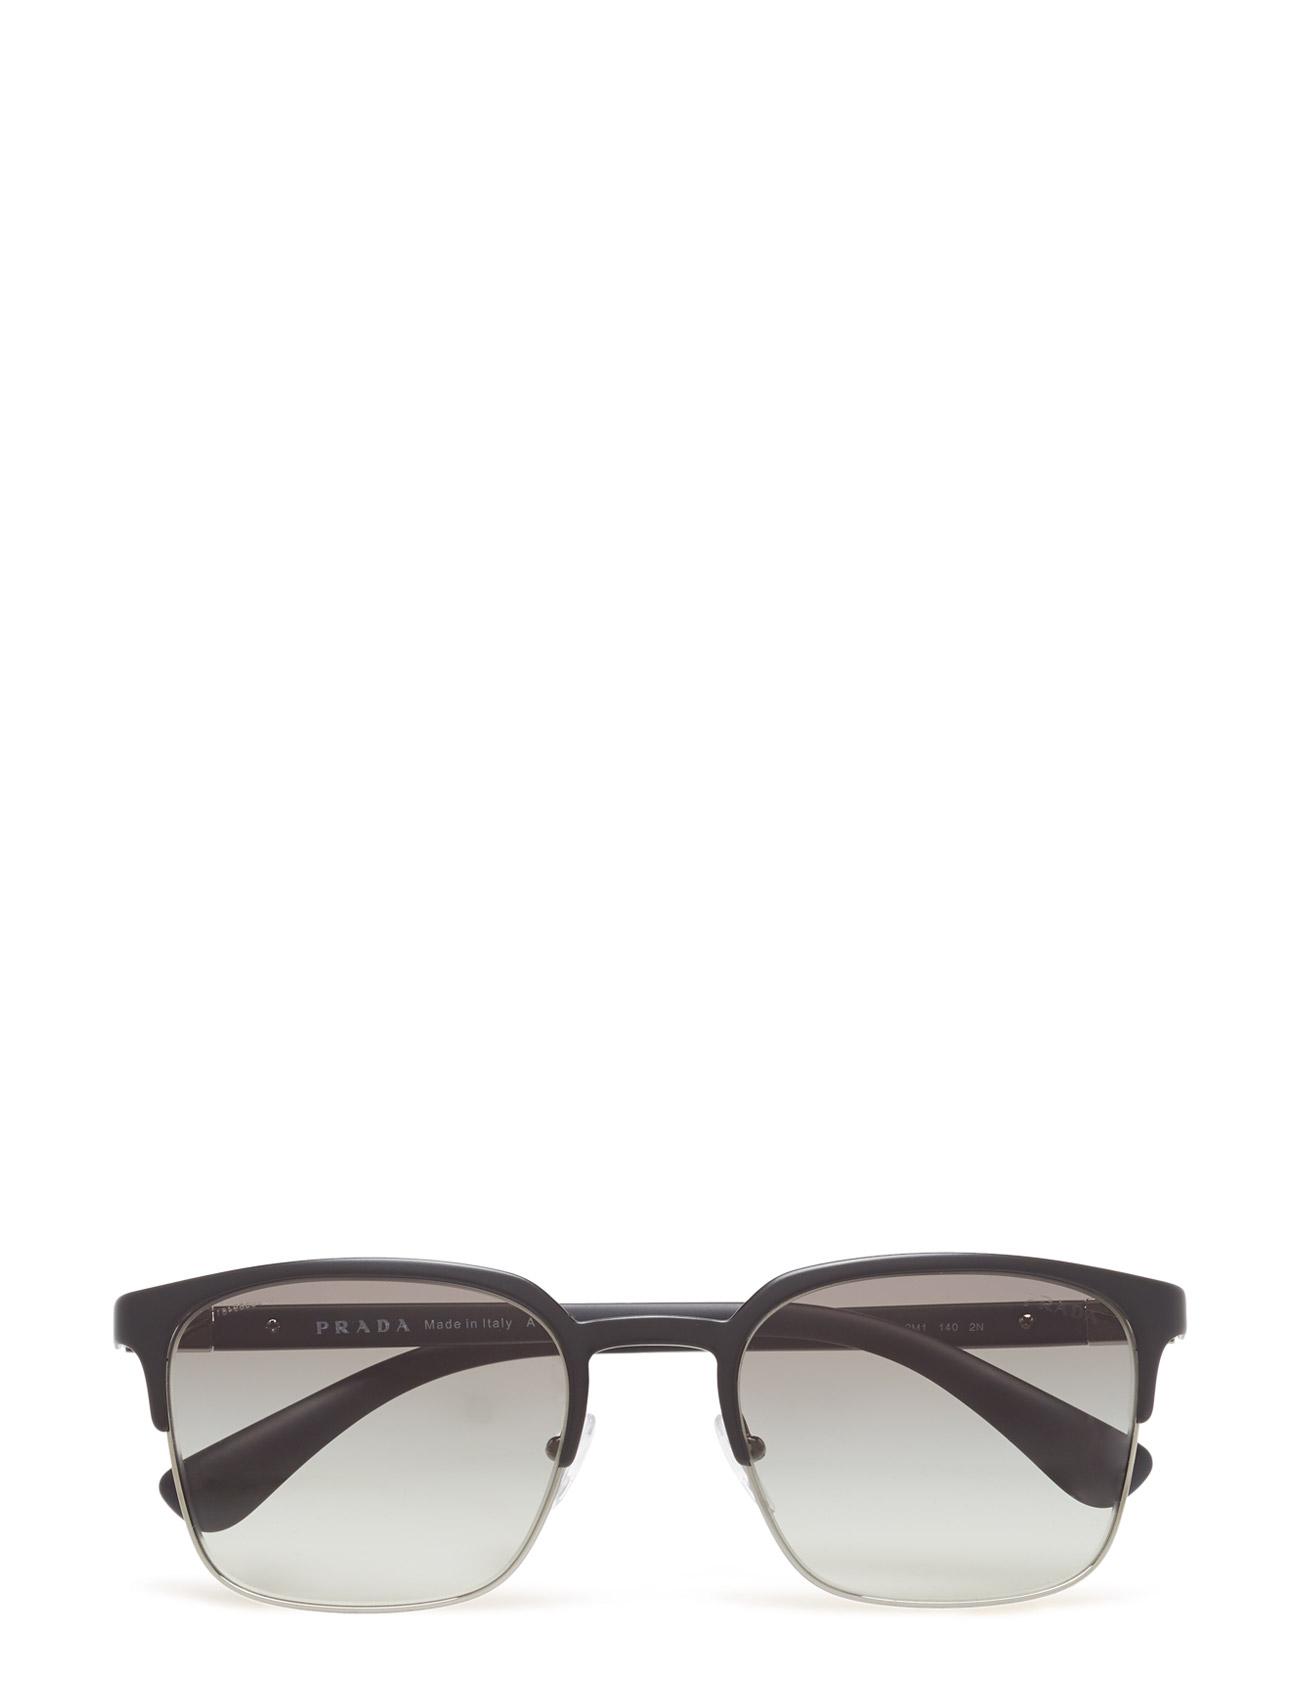 Heritage Prada Sunglasses Solbriller til Herrer i